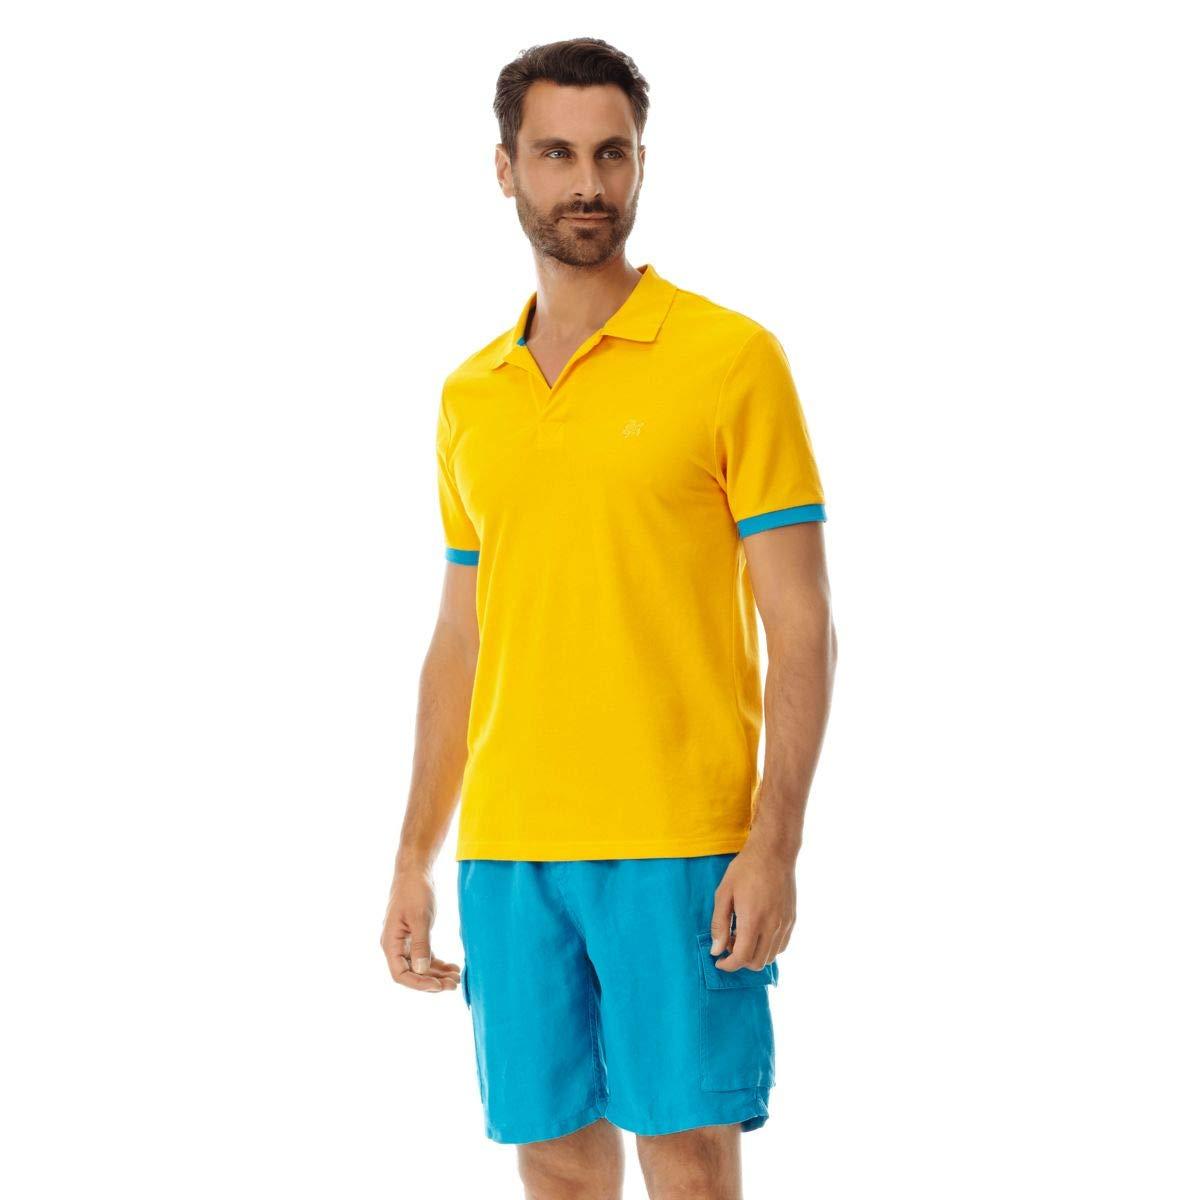 Mango XL Vilebrequin - Polo Homme uni piqué de Coton